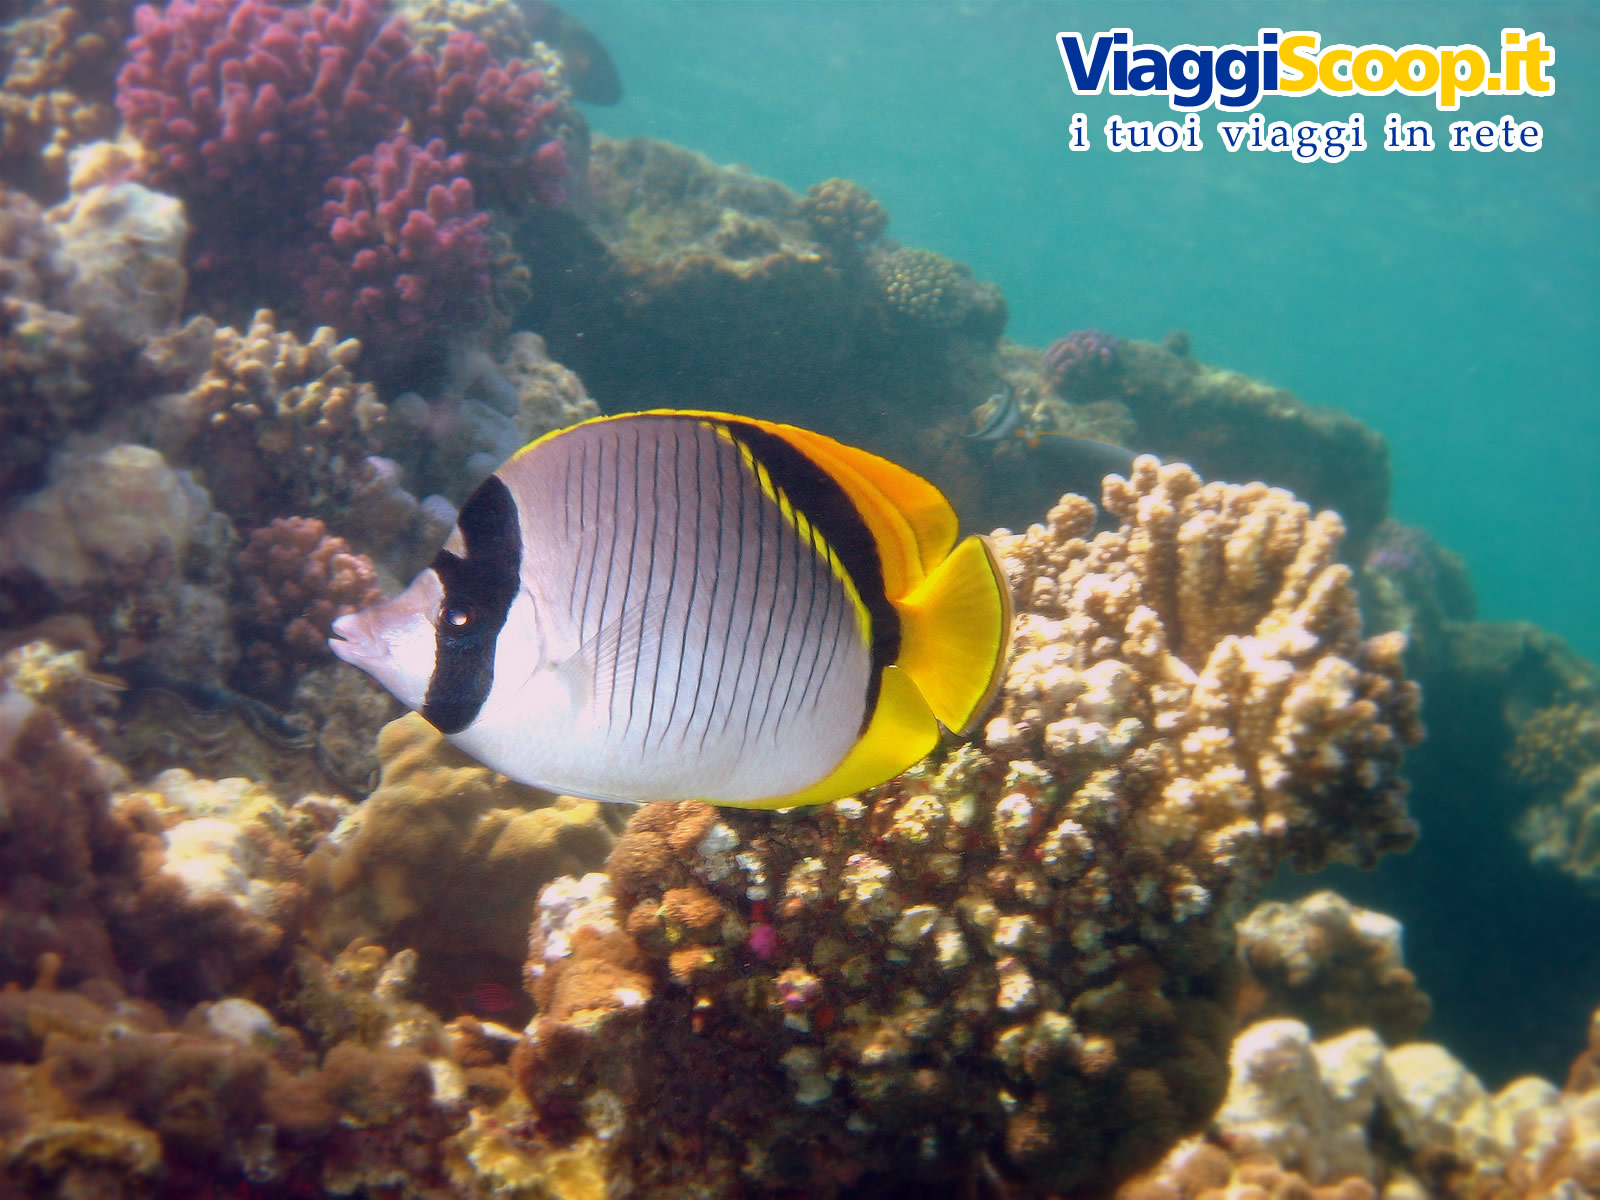 Sfondi desktop tropicali fondali marini pesci for Sfondi pesci tropicali